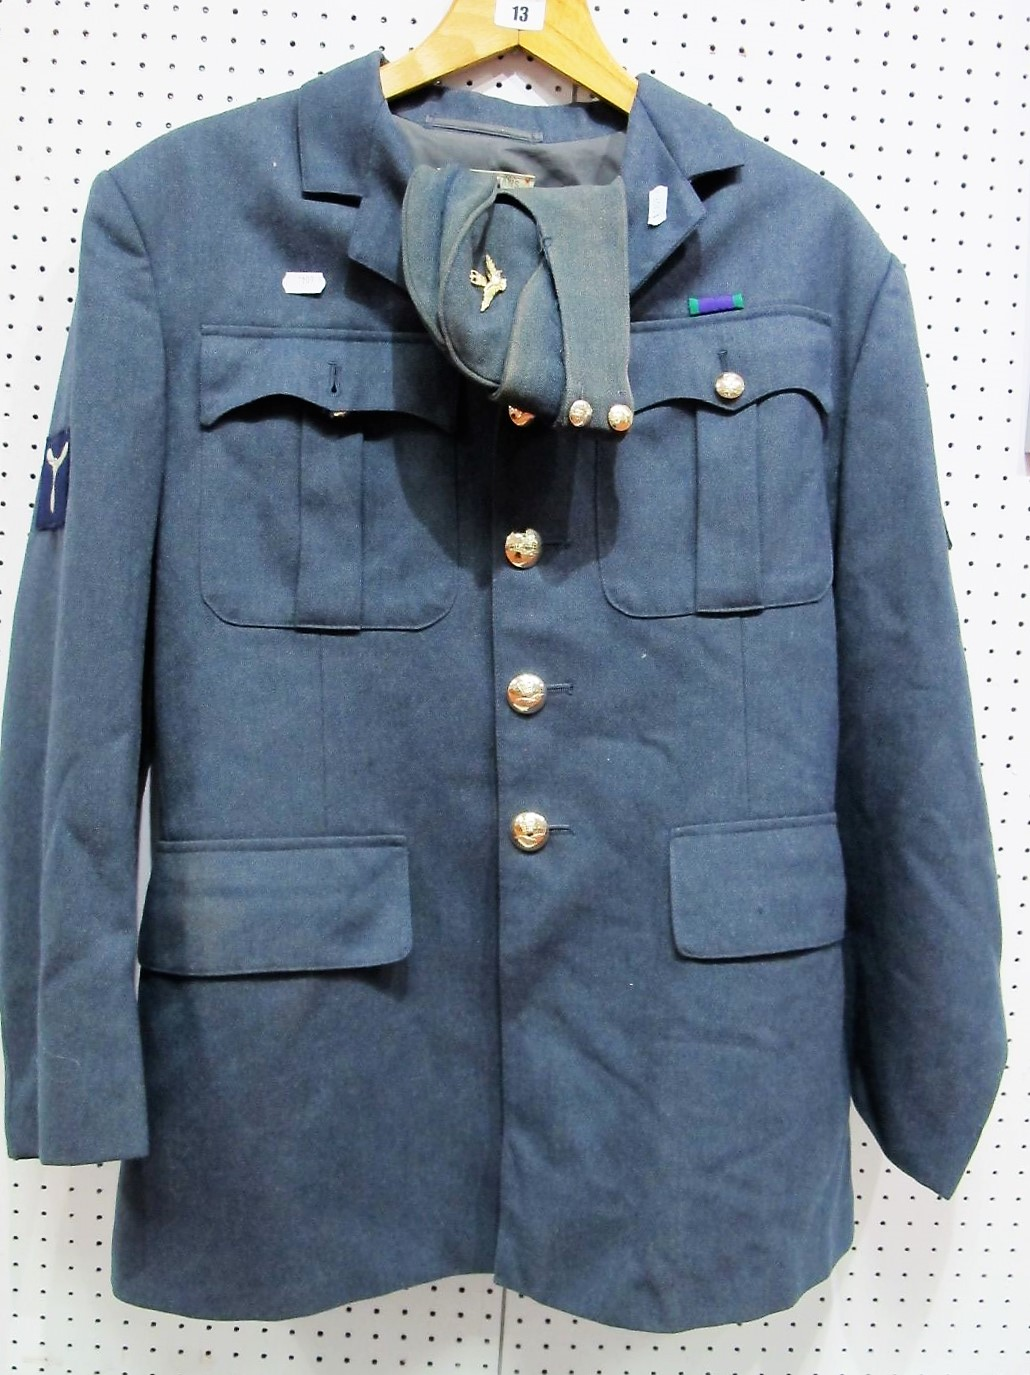 Lot 13 - A Mid XX Century R.A.F No. 1 Uniform Jacket, with G.S.M medal ribbon; Plus Worn R.A.F Forage Cap. (